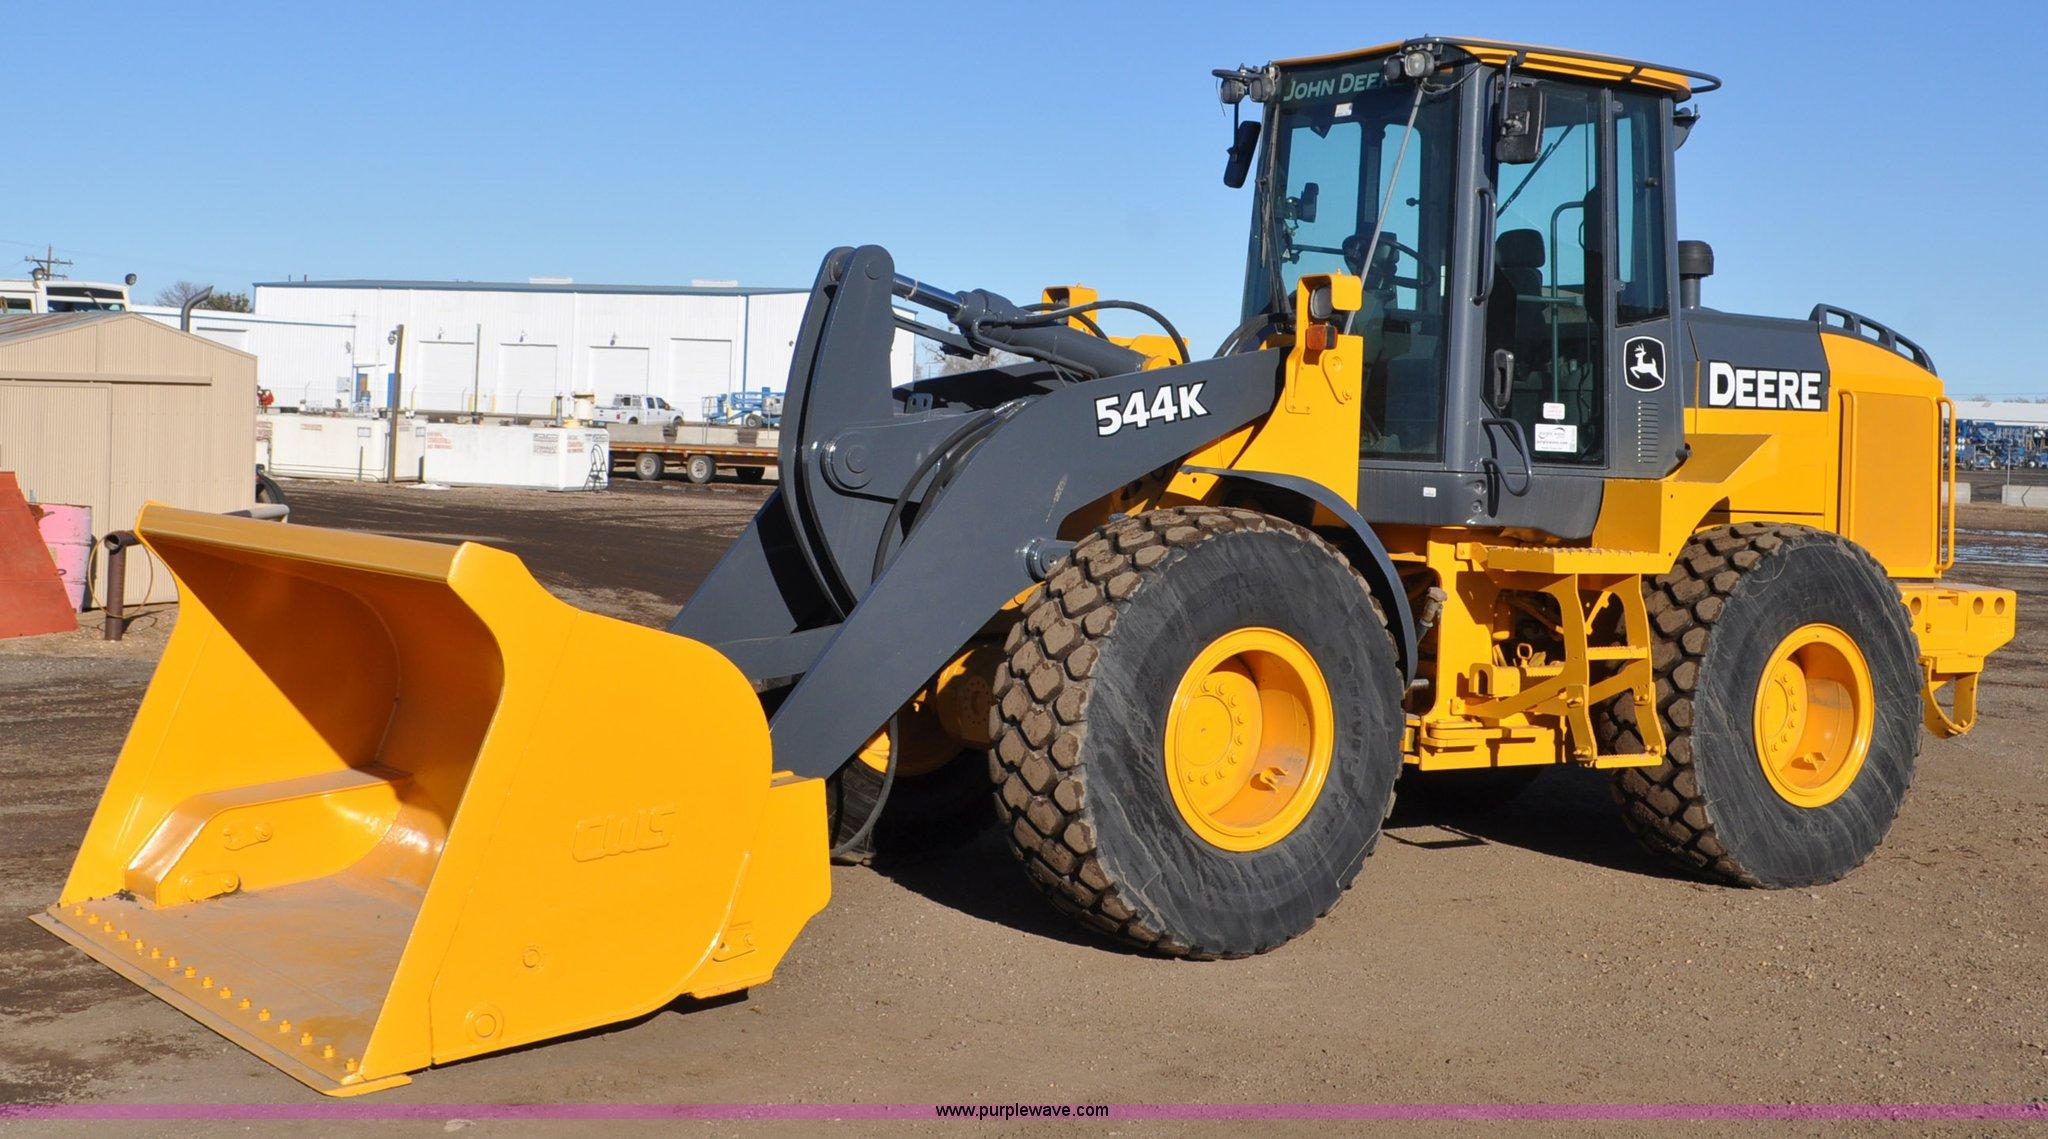 2011 John Deere 544k Wheel Loader Item G7235 Sold